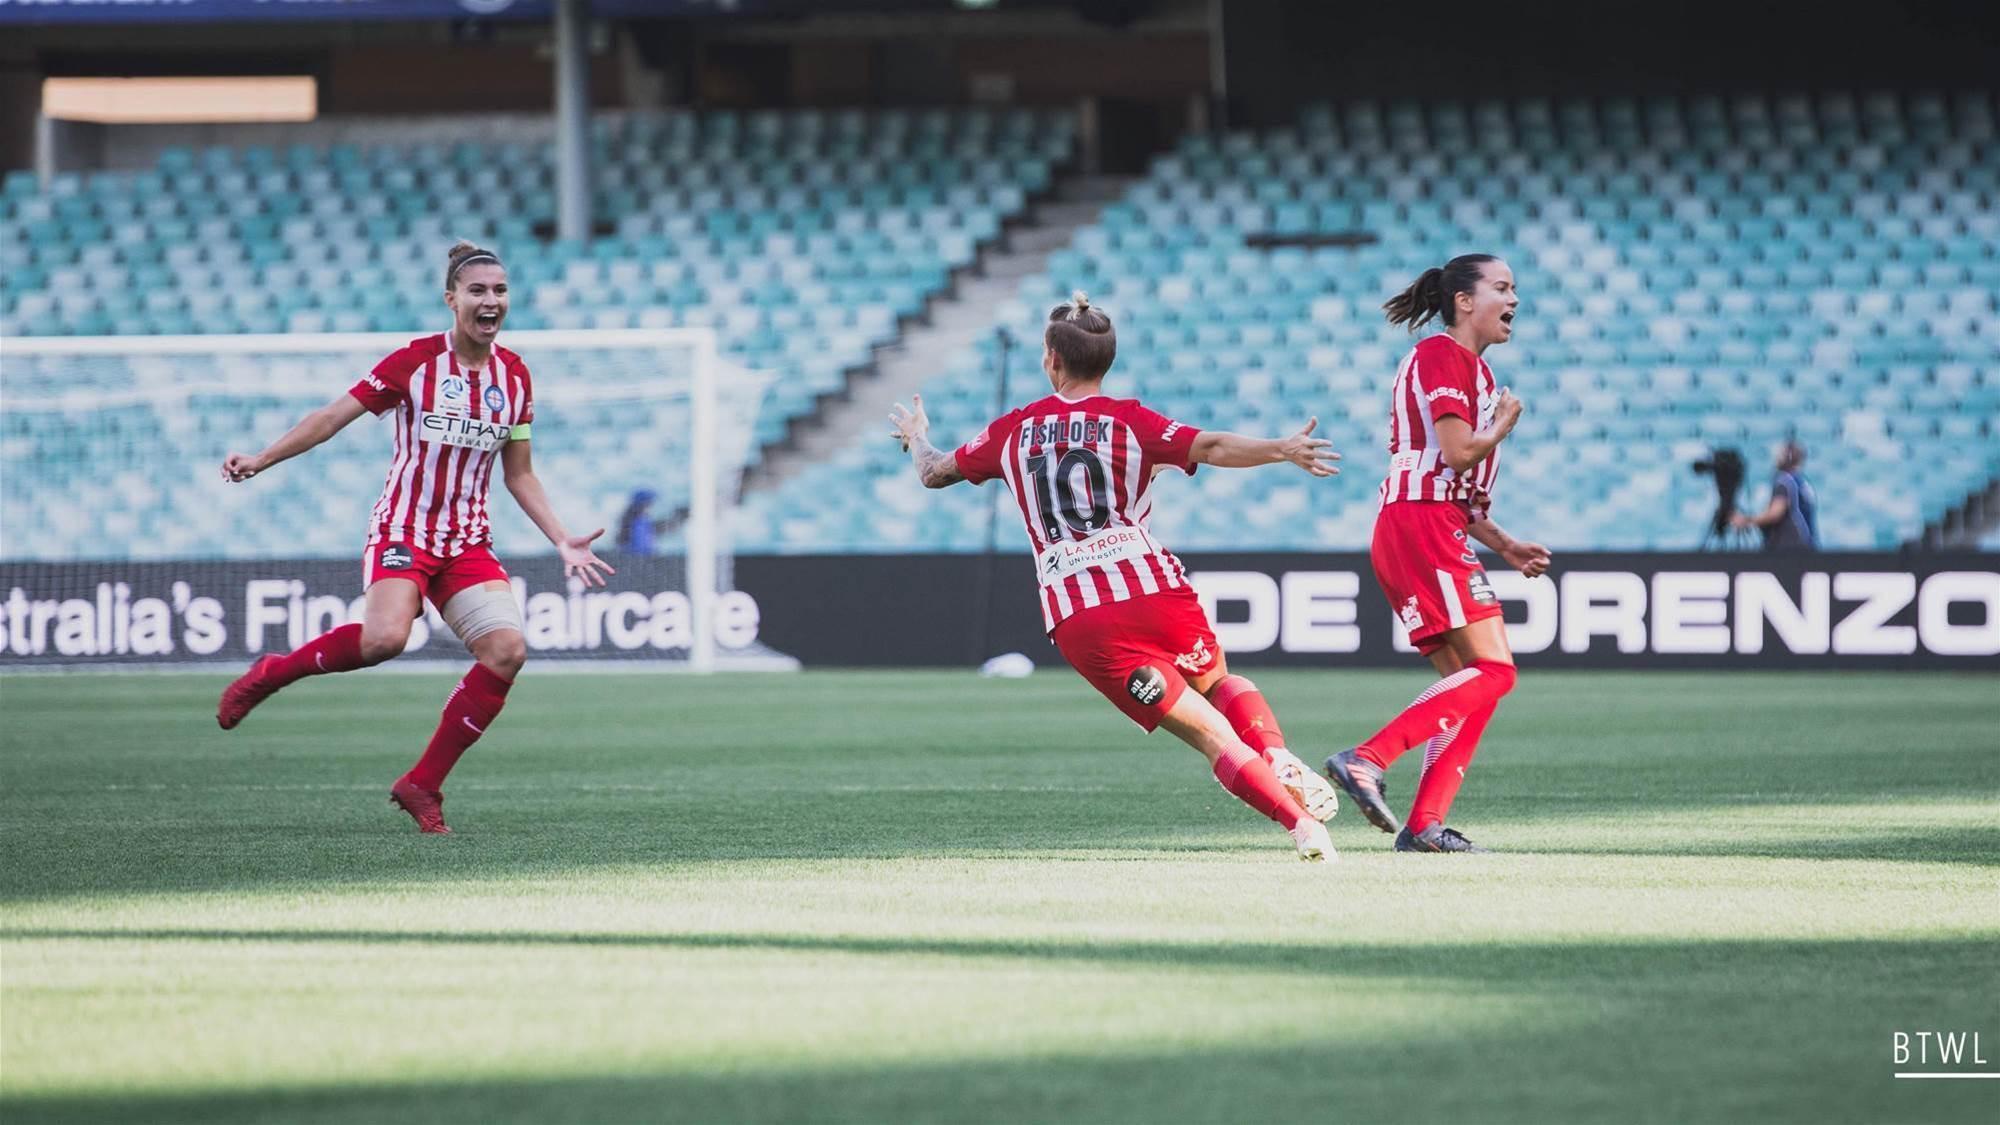 City break Australian record with third Championship